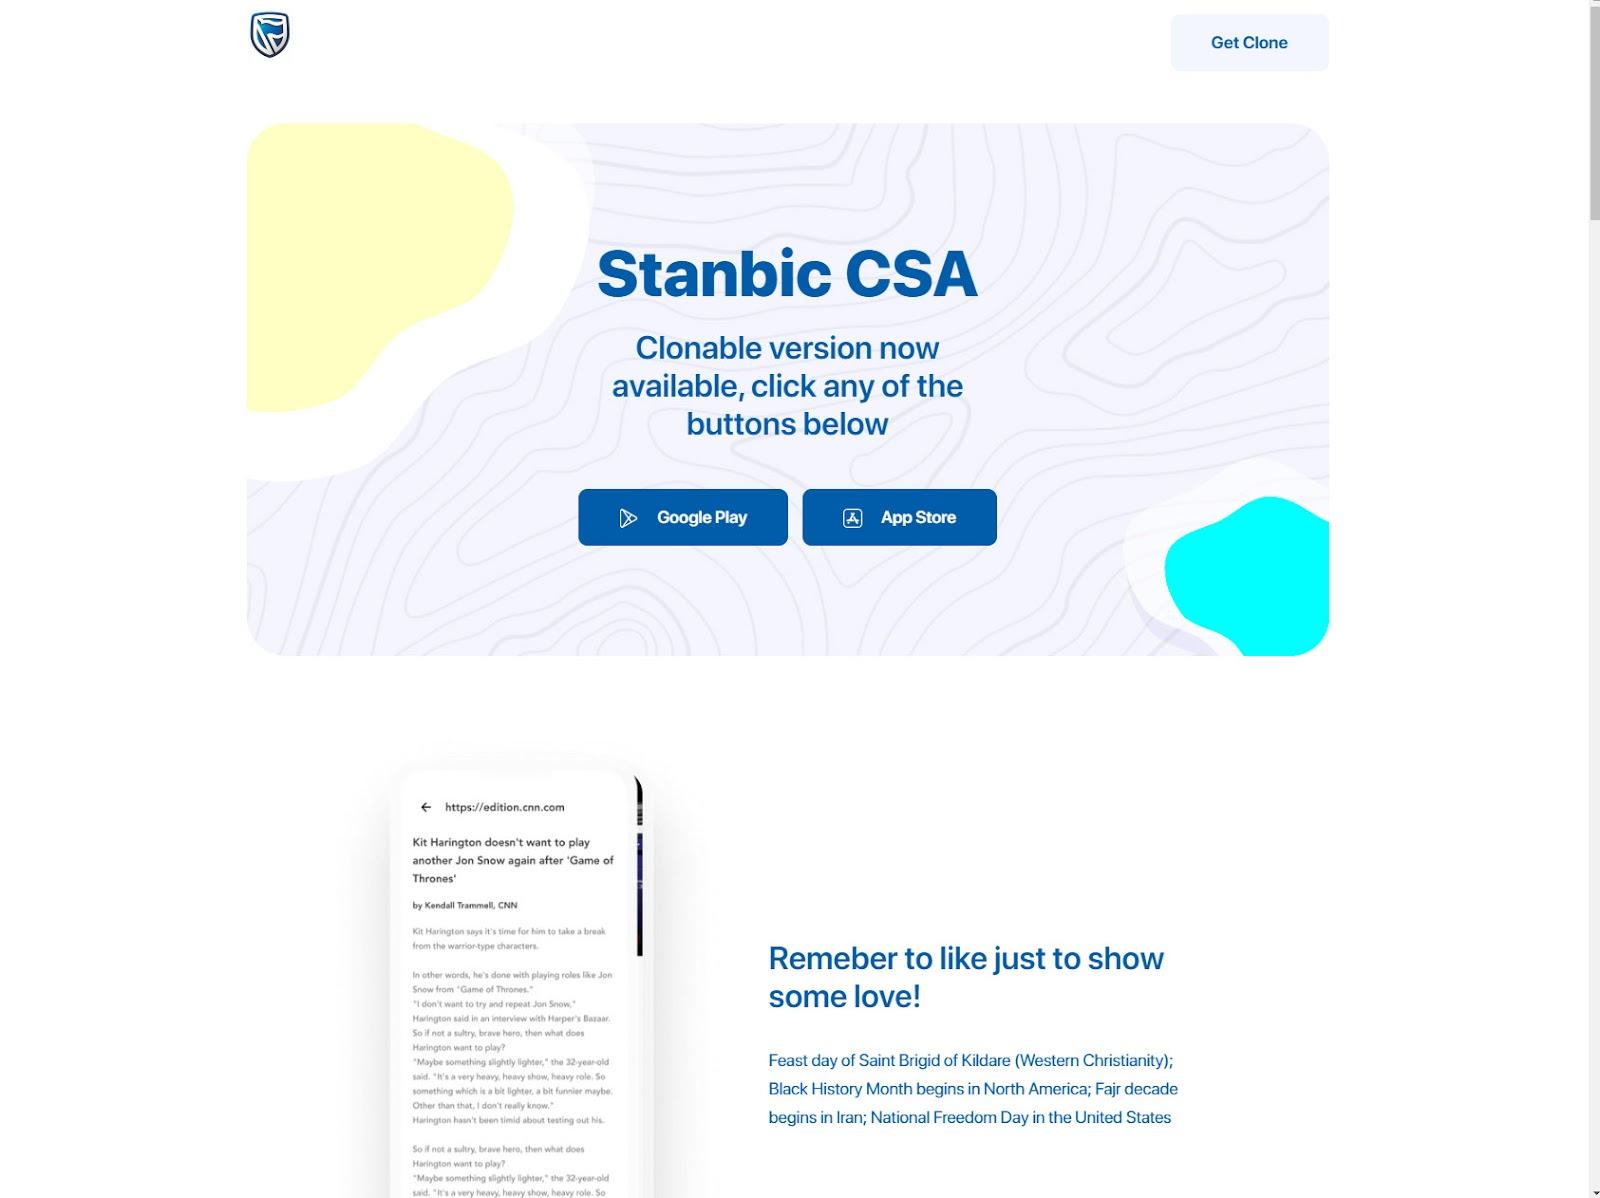 Stanbic CSA homepage